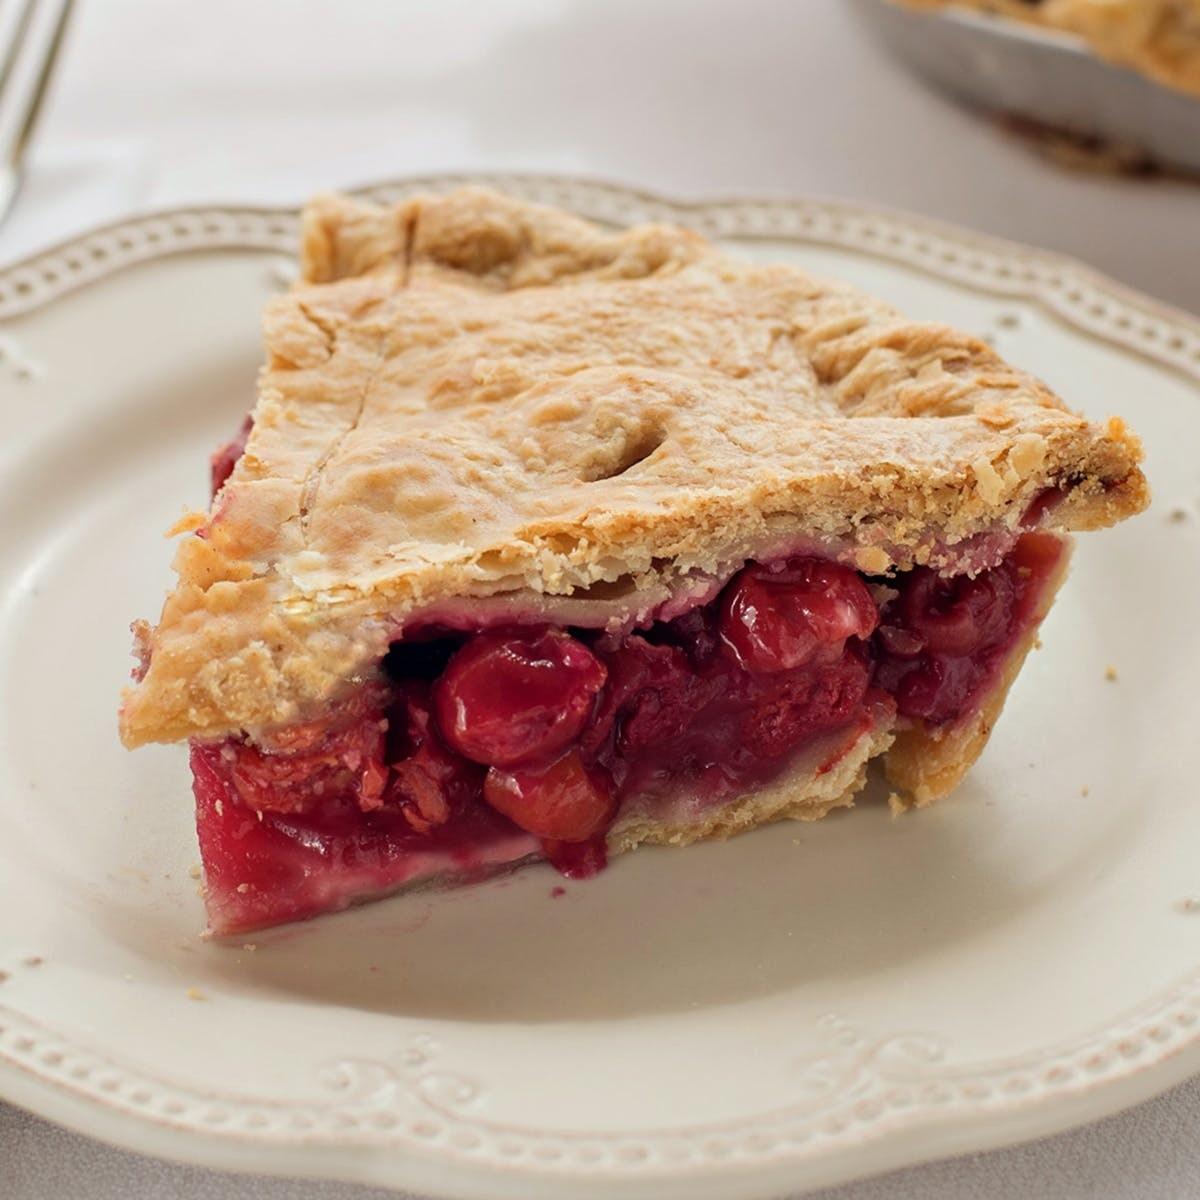 A slice of fresh Grand Traverse Pie Company's cherry pie on a white plate.